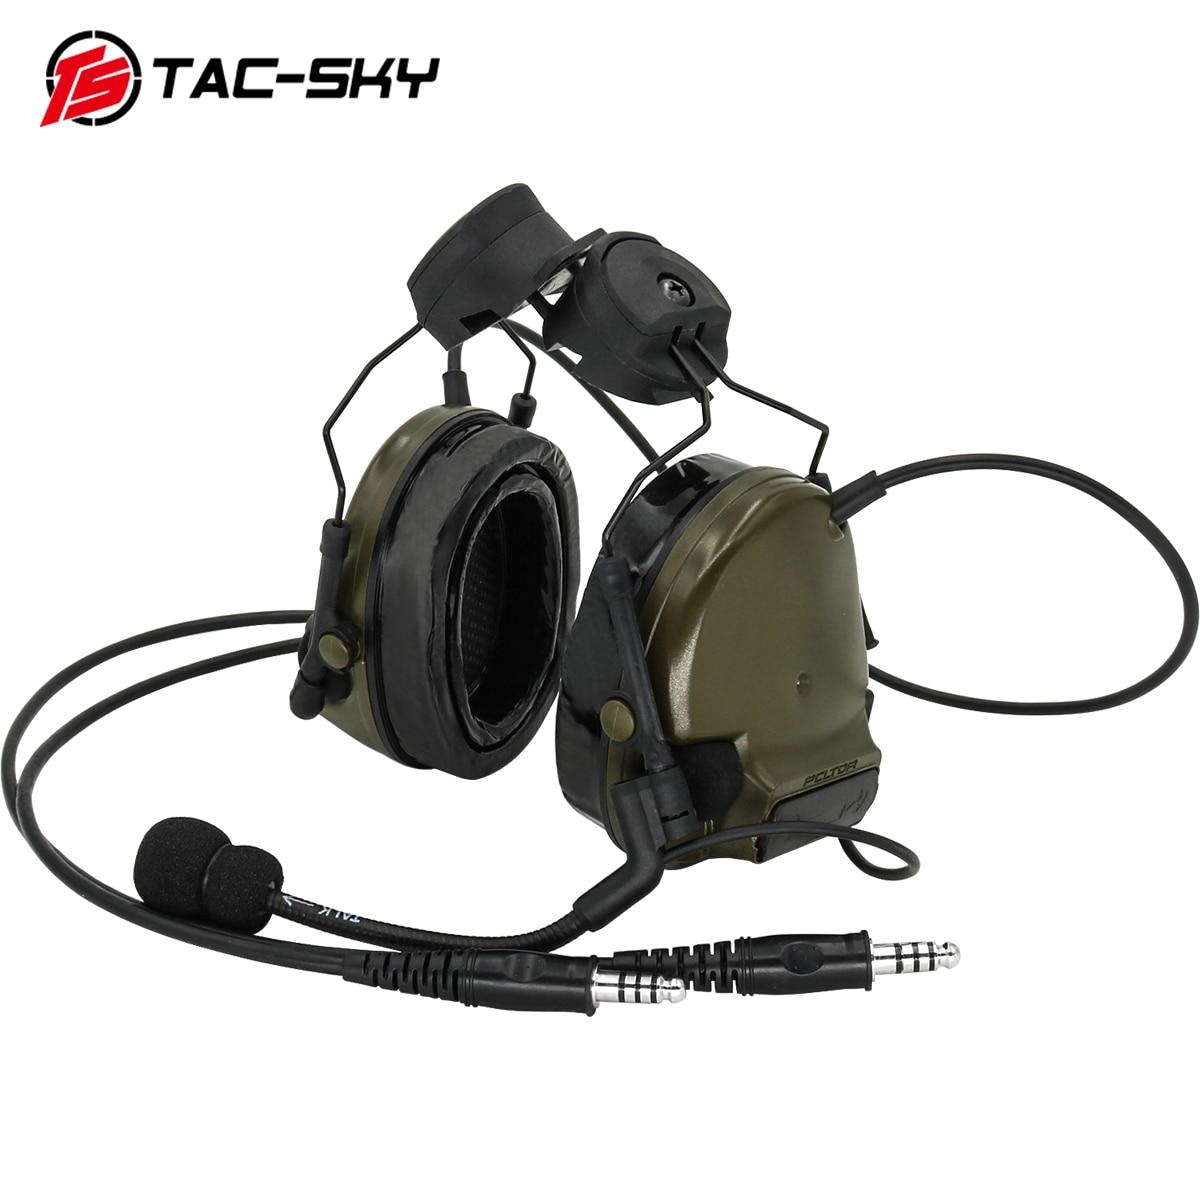 TAC-SKY COMTAC tactical bracket headset comtac iii dual communication silicone earmuff helmet bracket military tactical headset